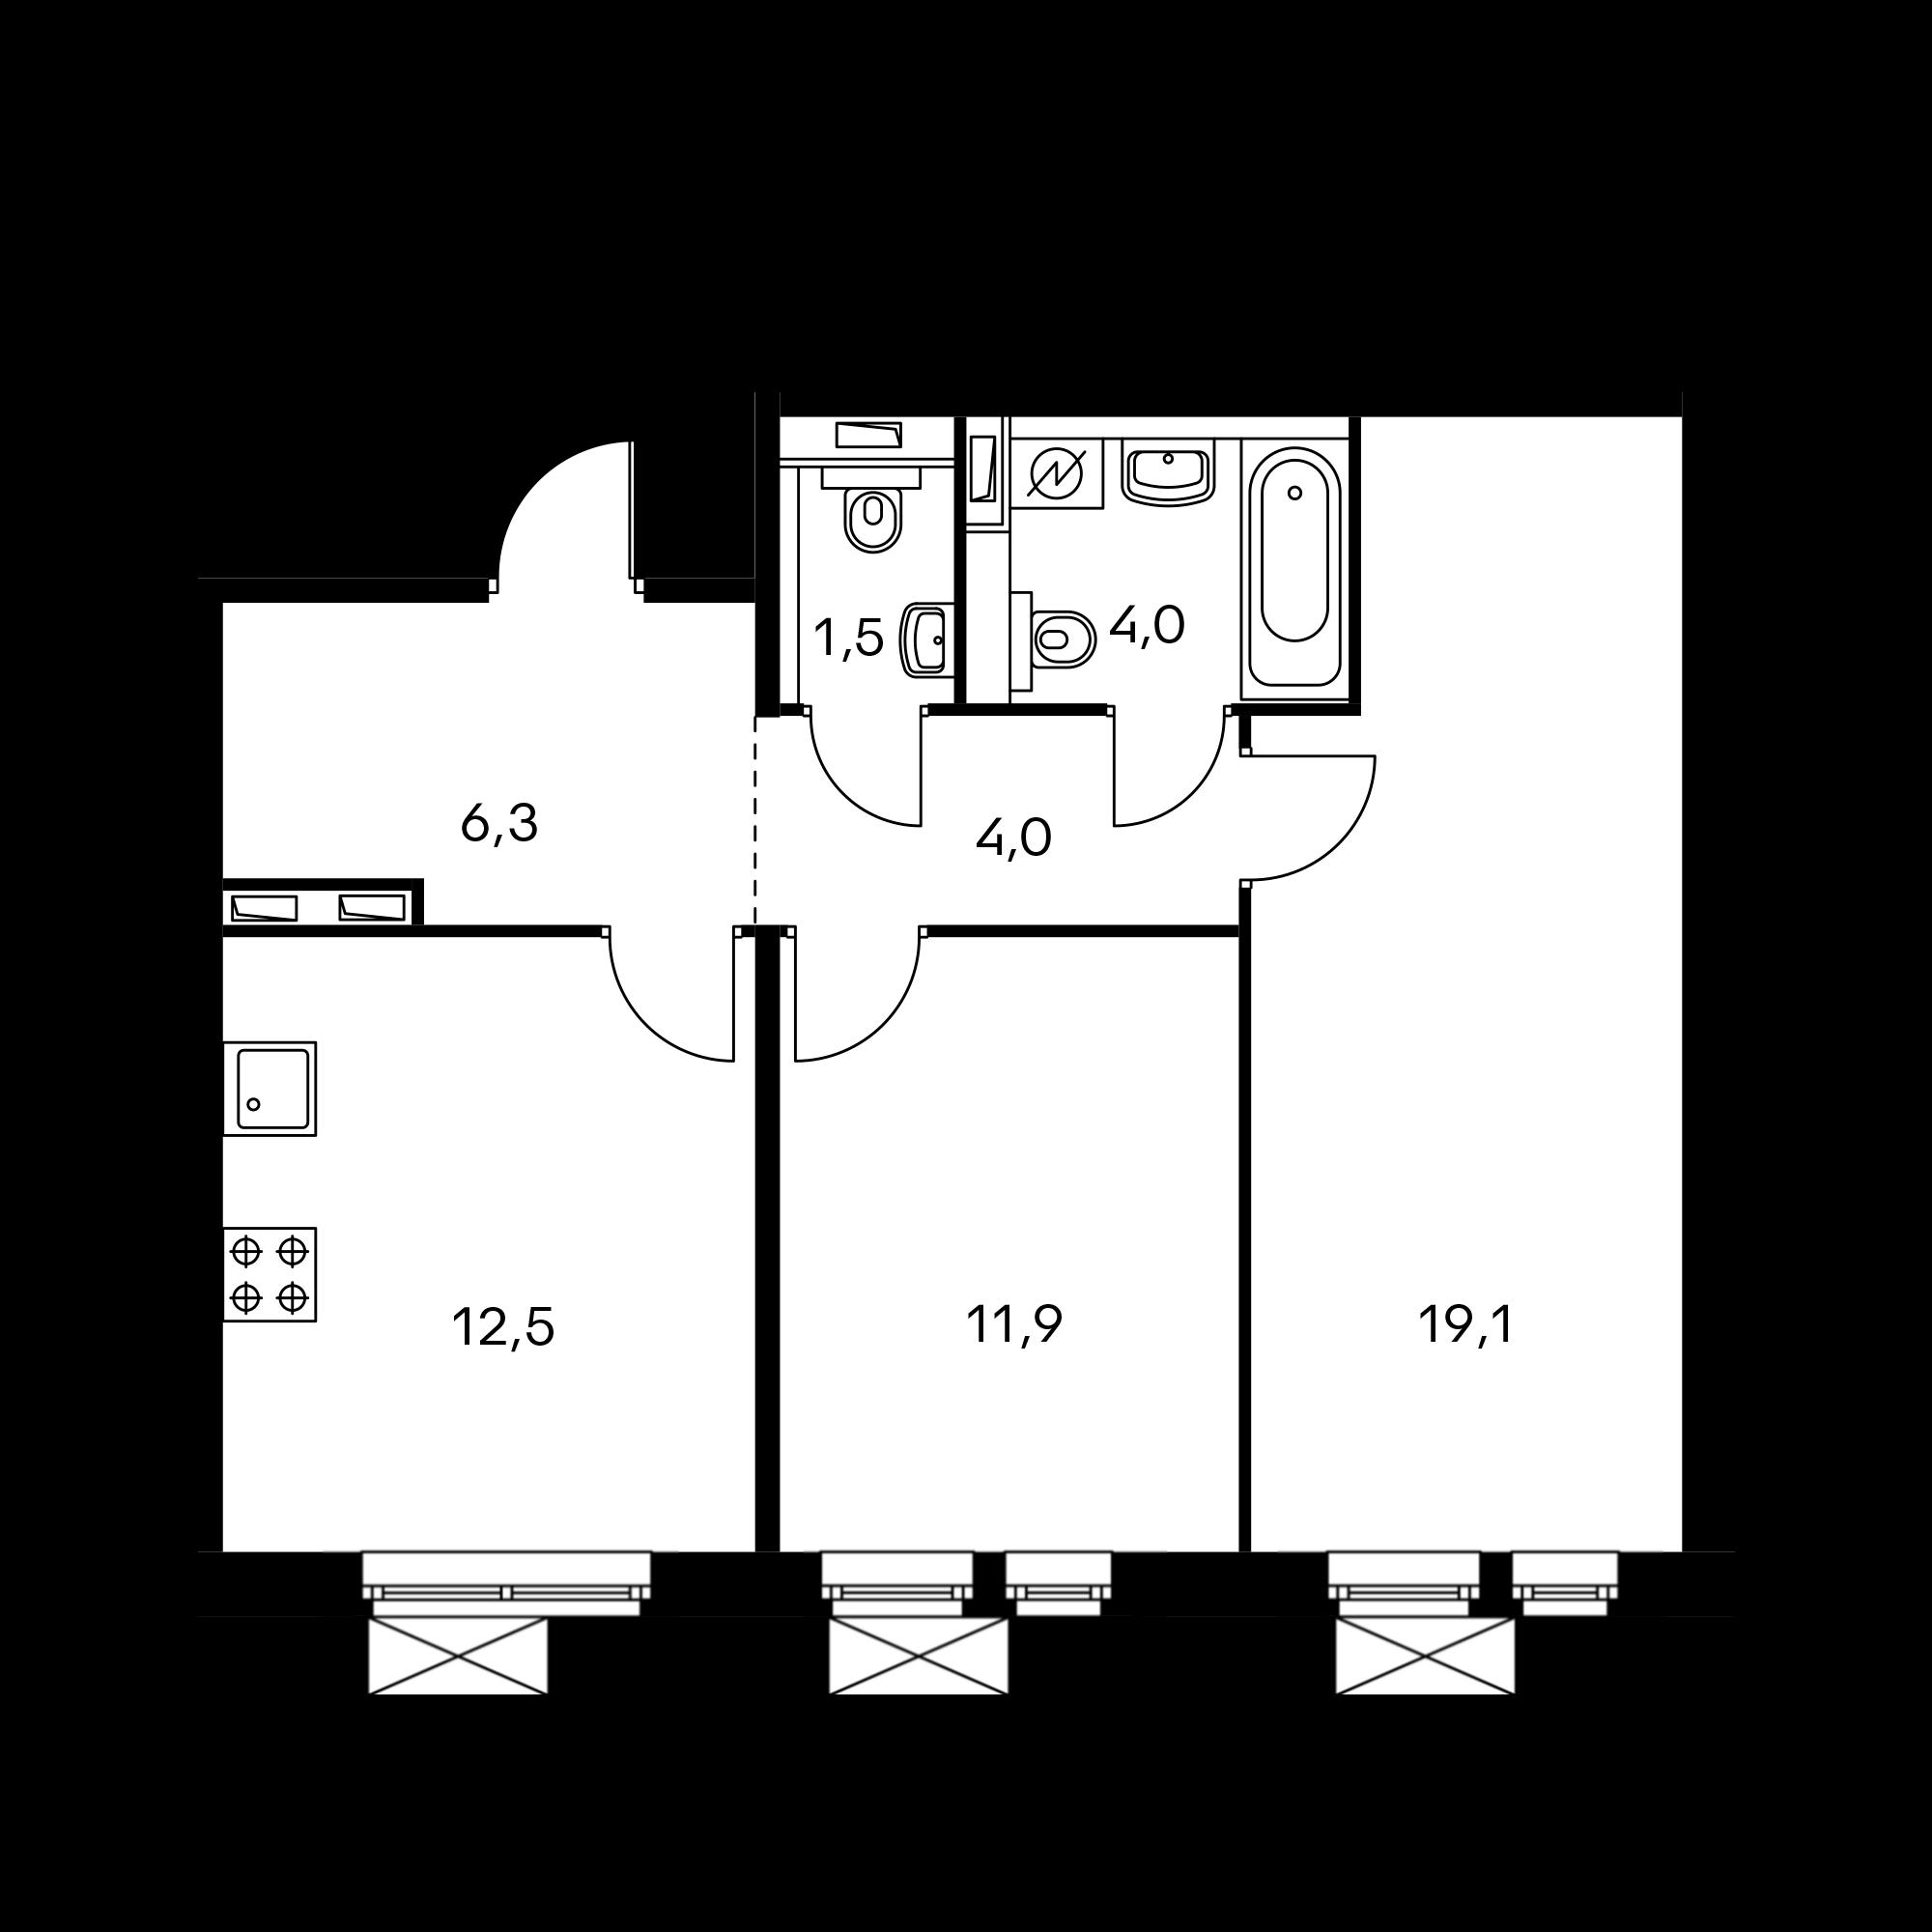 2KM4_9.3-2_S_Z